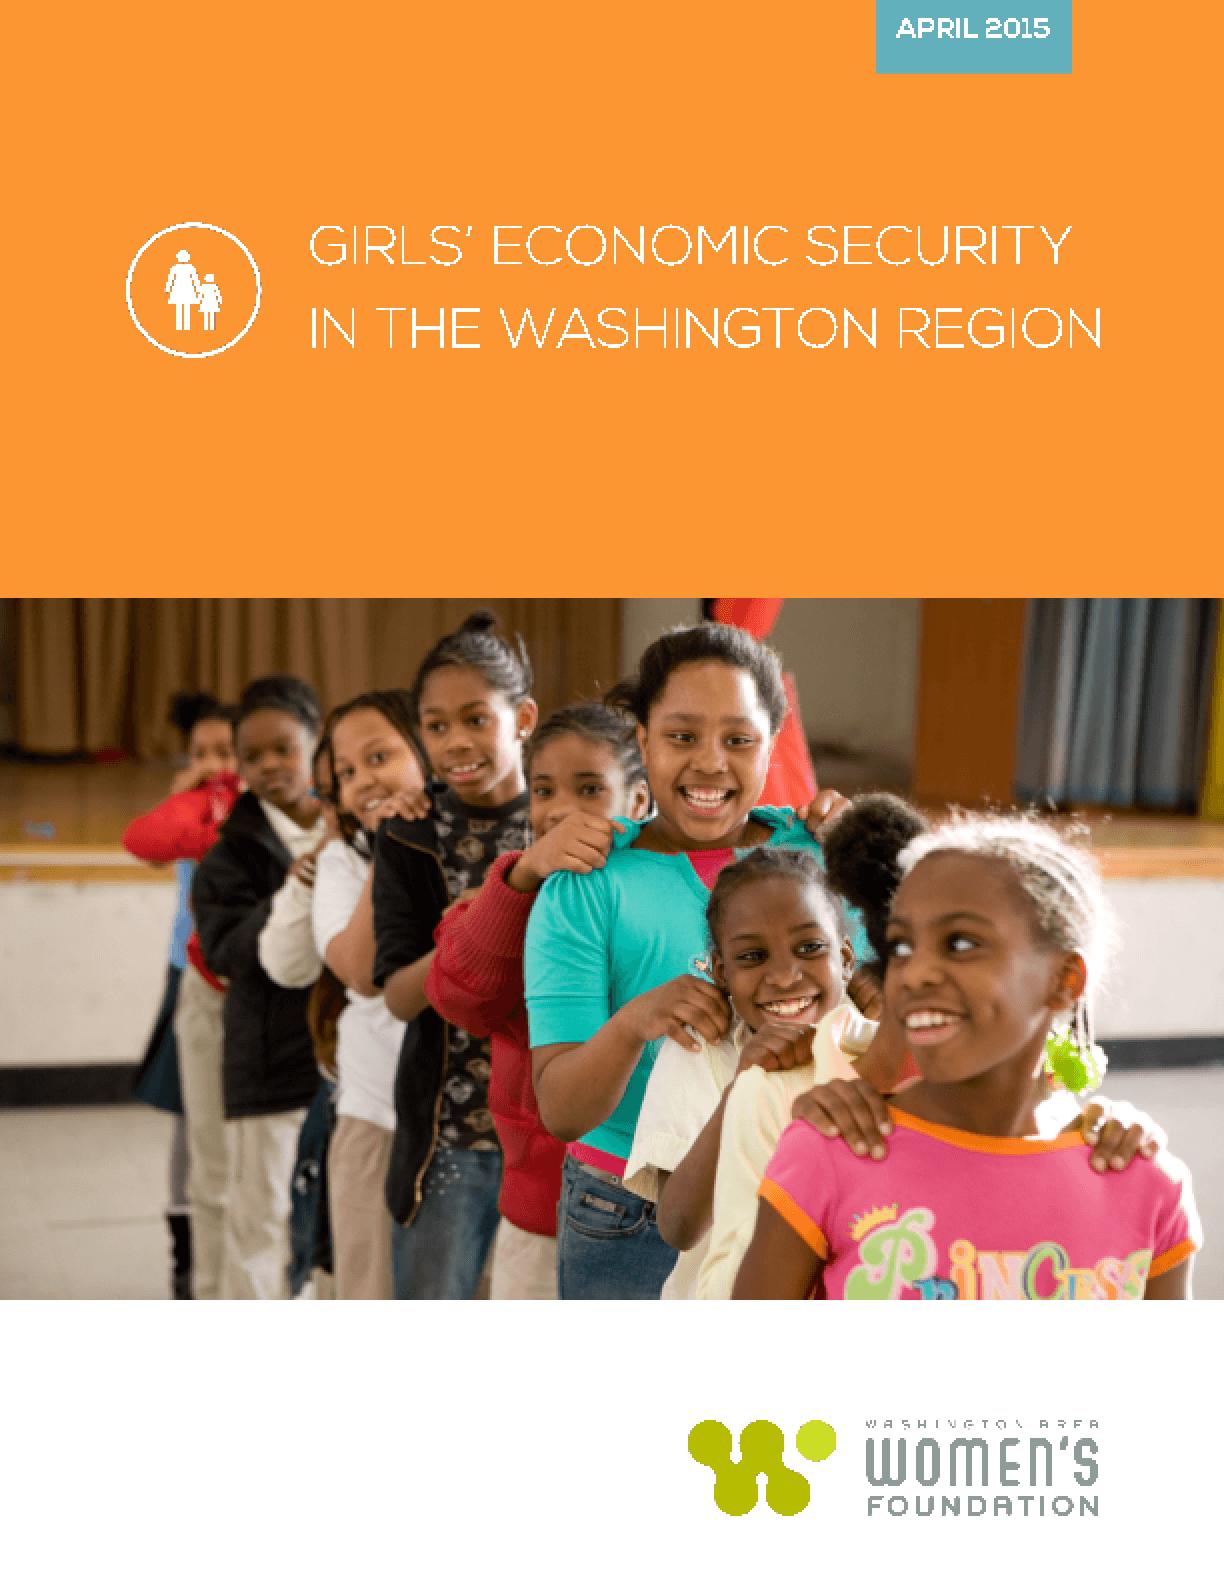 Girls' Economic Security in the Washington Region